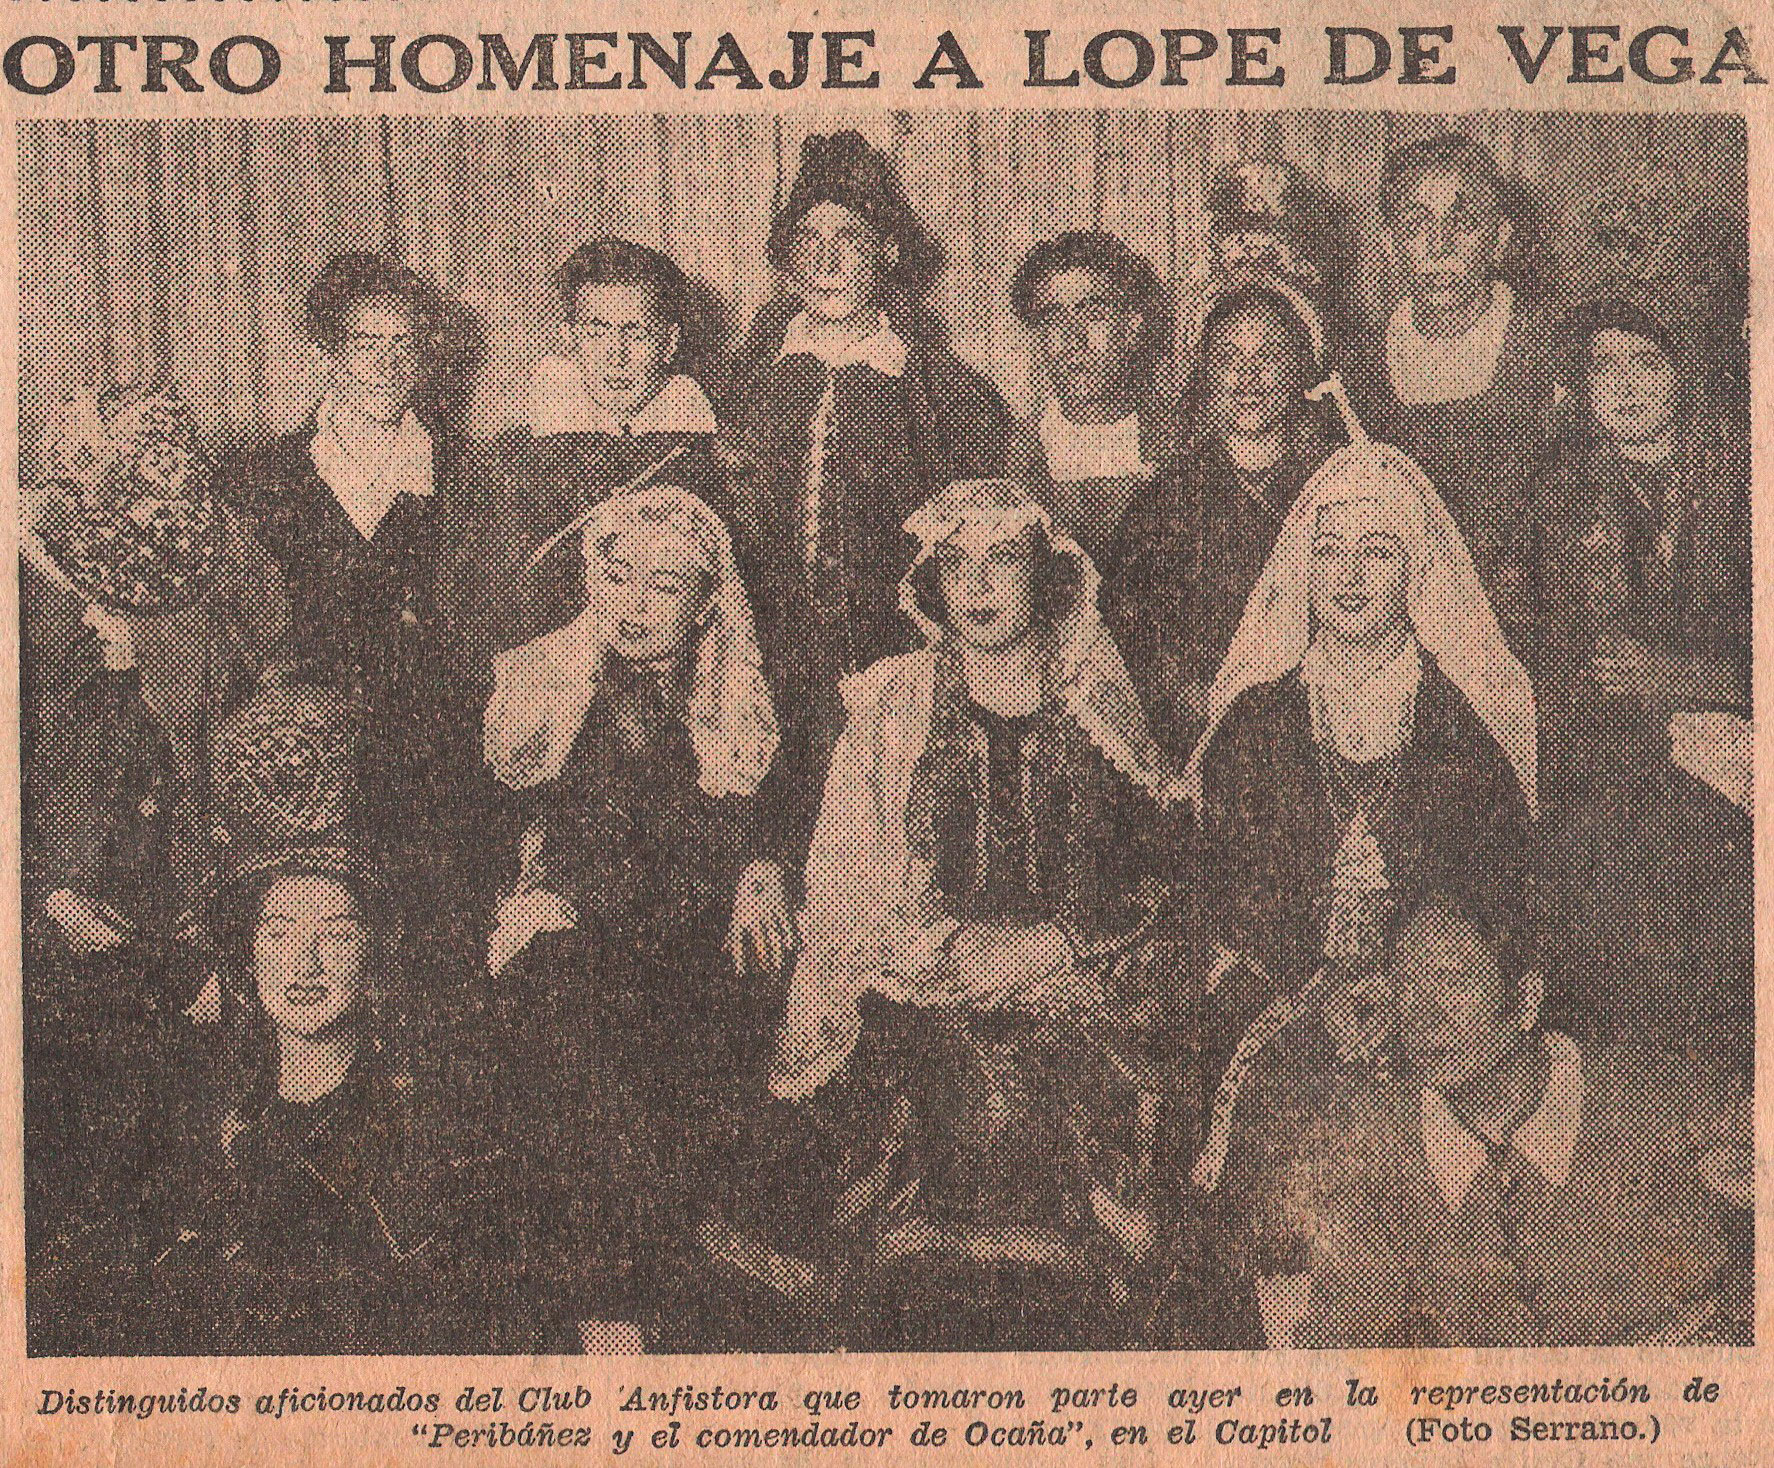 1935.1-jhc-Club-Anfistora